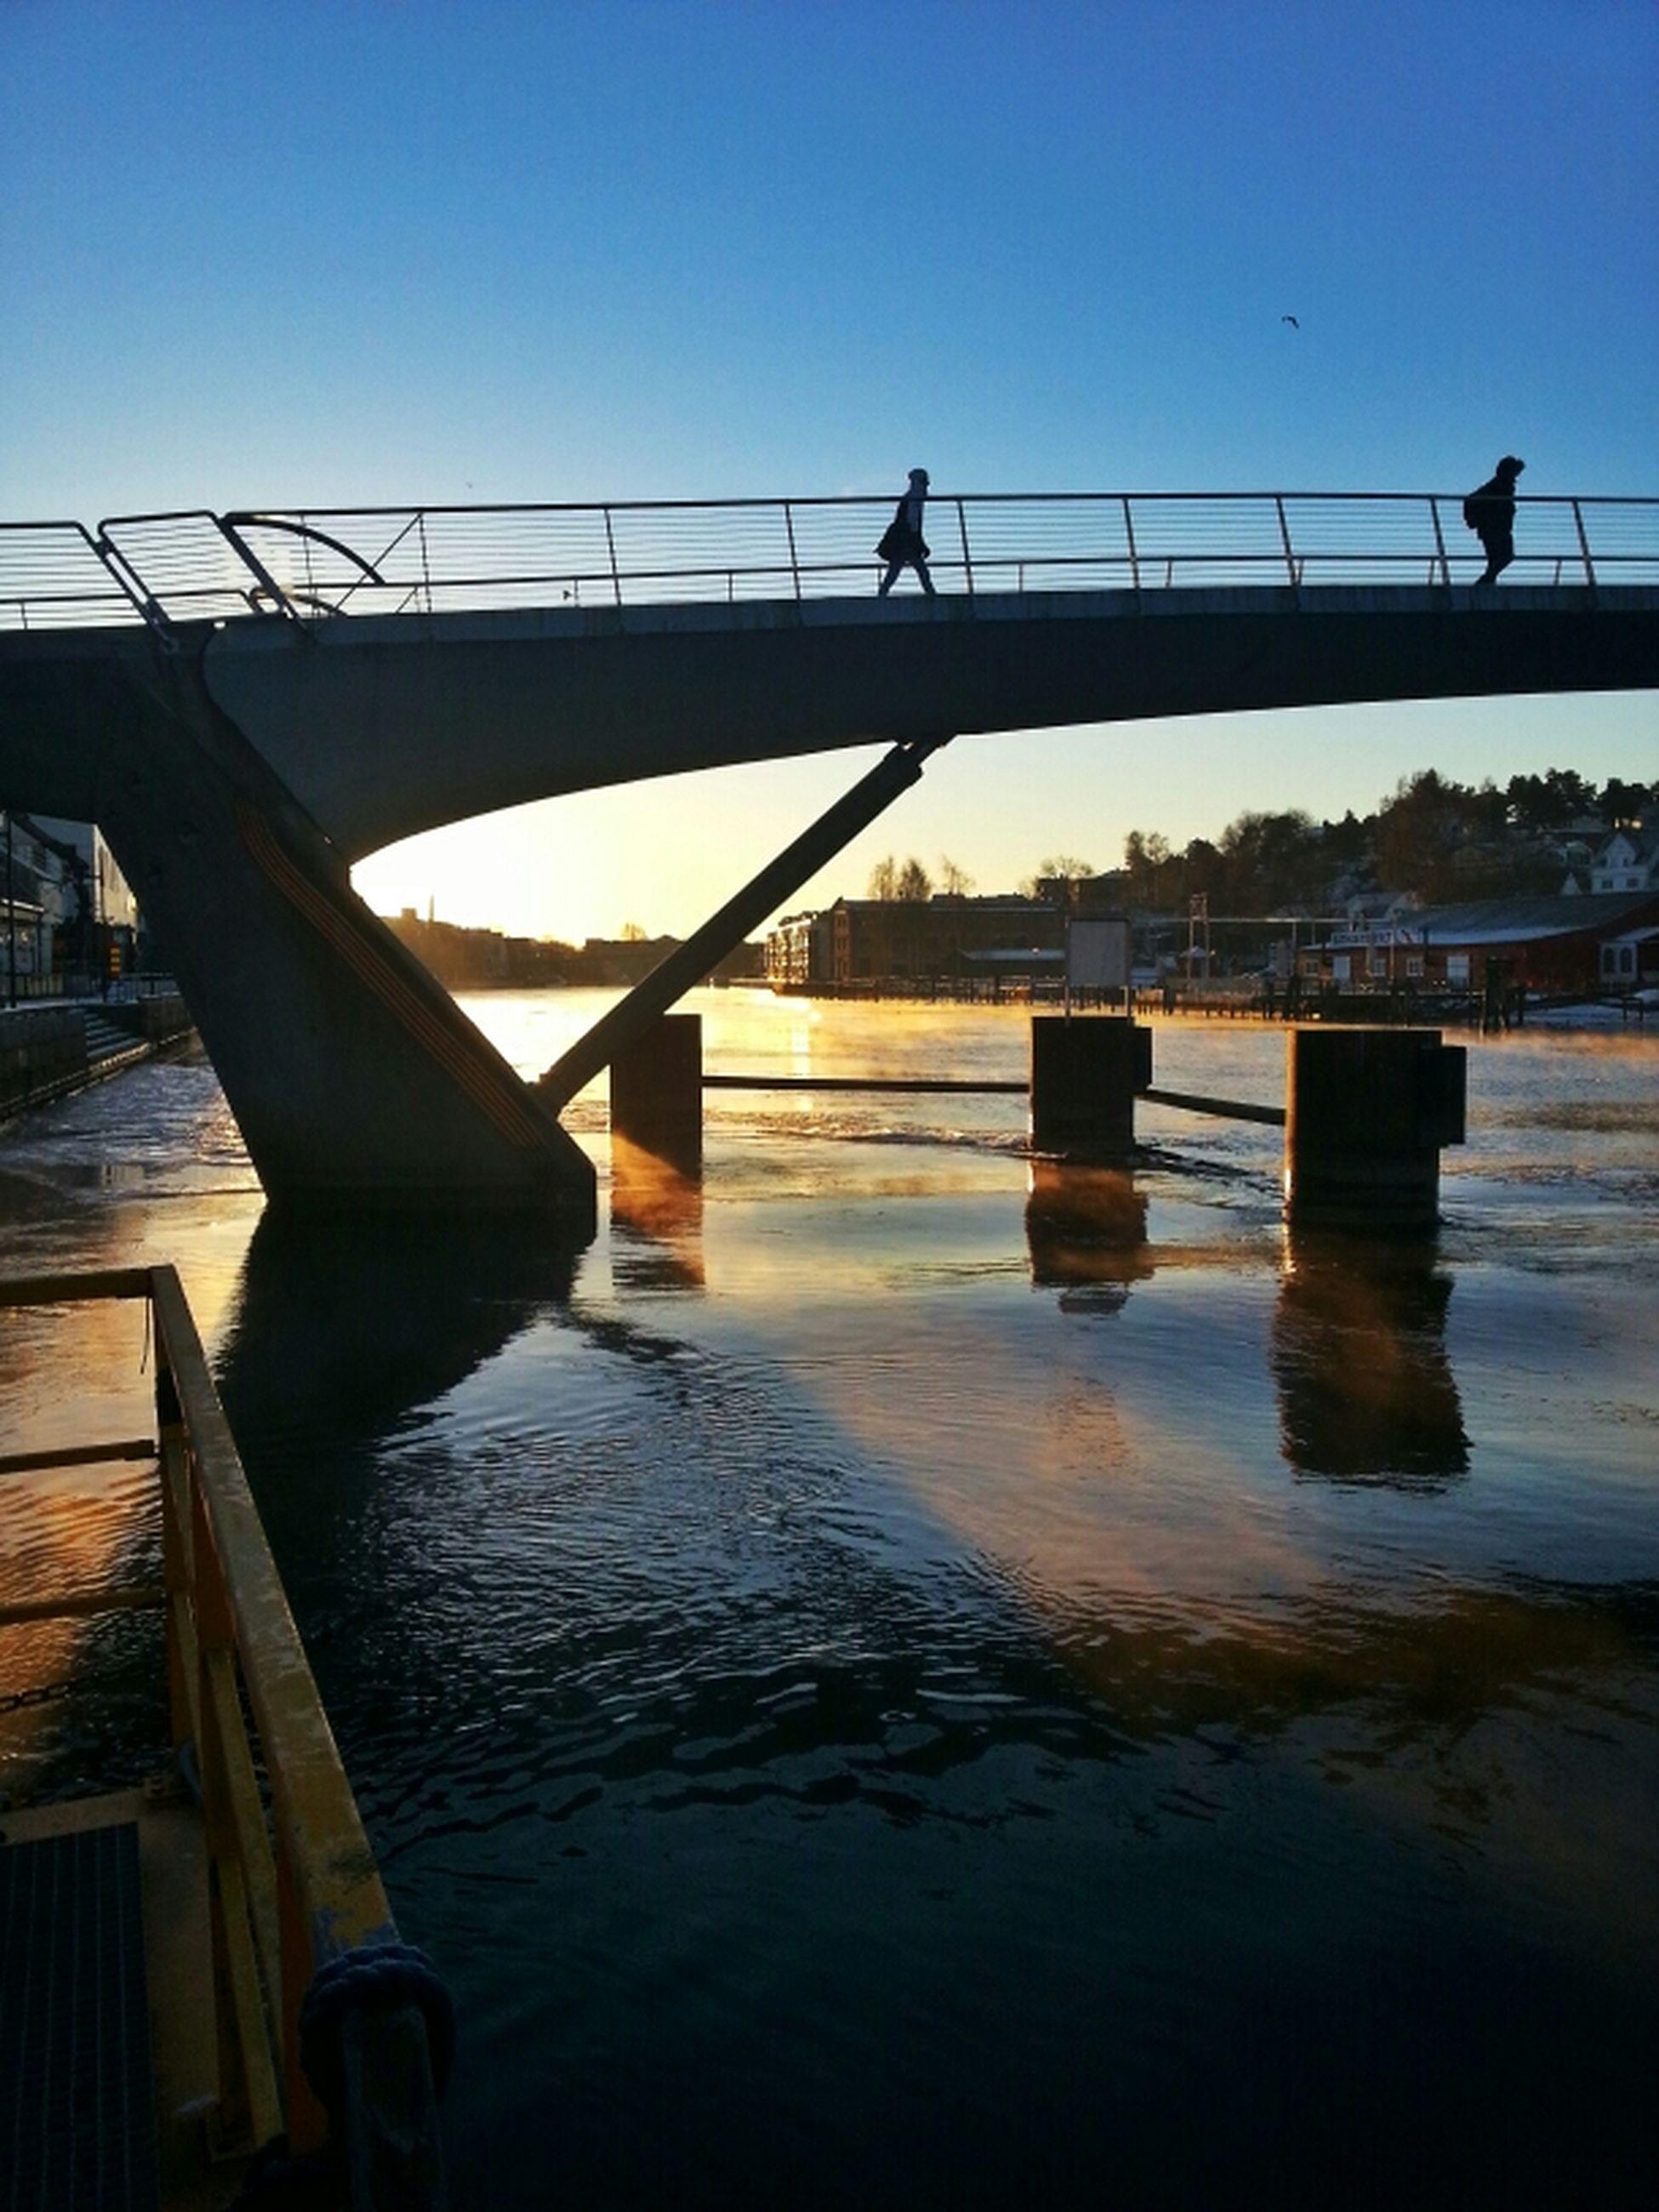 water, clear sky, built structure, transportation, men, bridge - man made structure, sea, architecture, pier, railing, lifestyles, river, nautical vessel, connection, sunlight, sky, standing, copy space